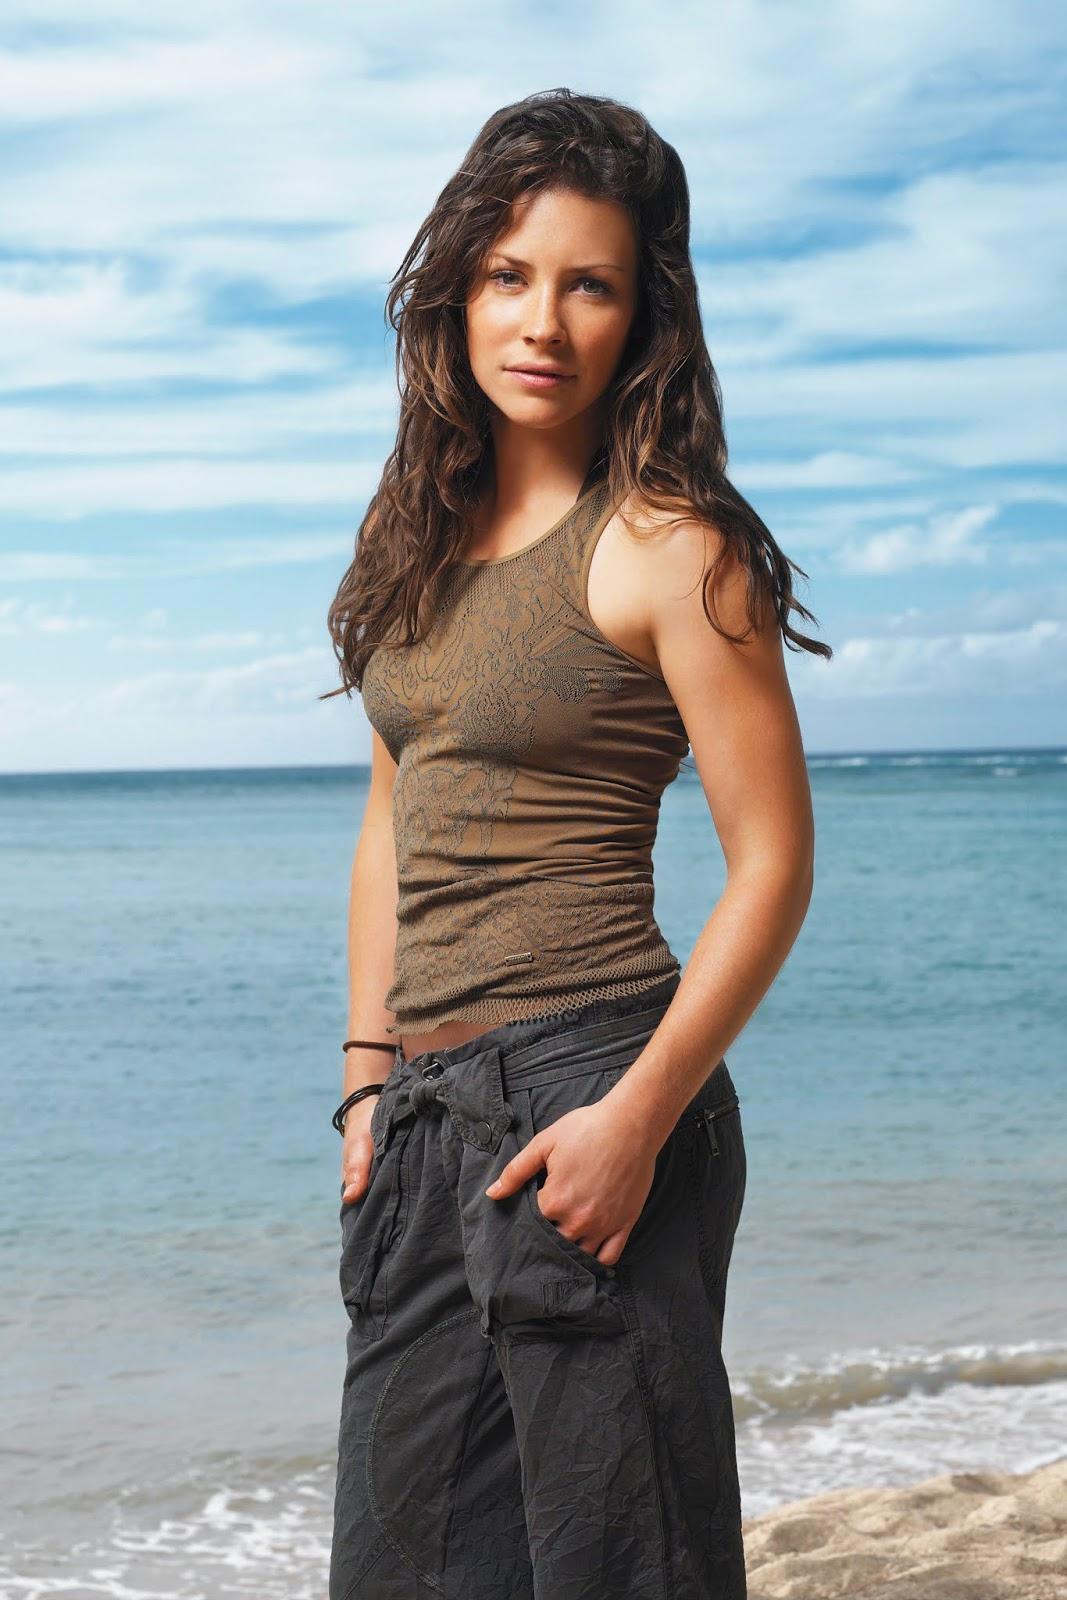 Evangeline Lilly manis baju kaos ketat artis Hollywood